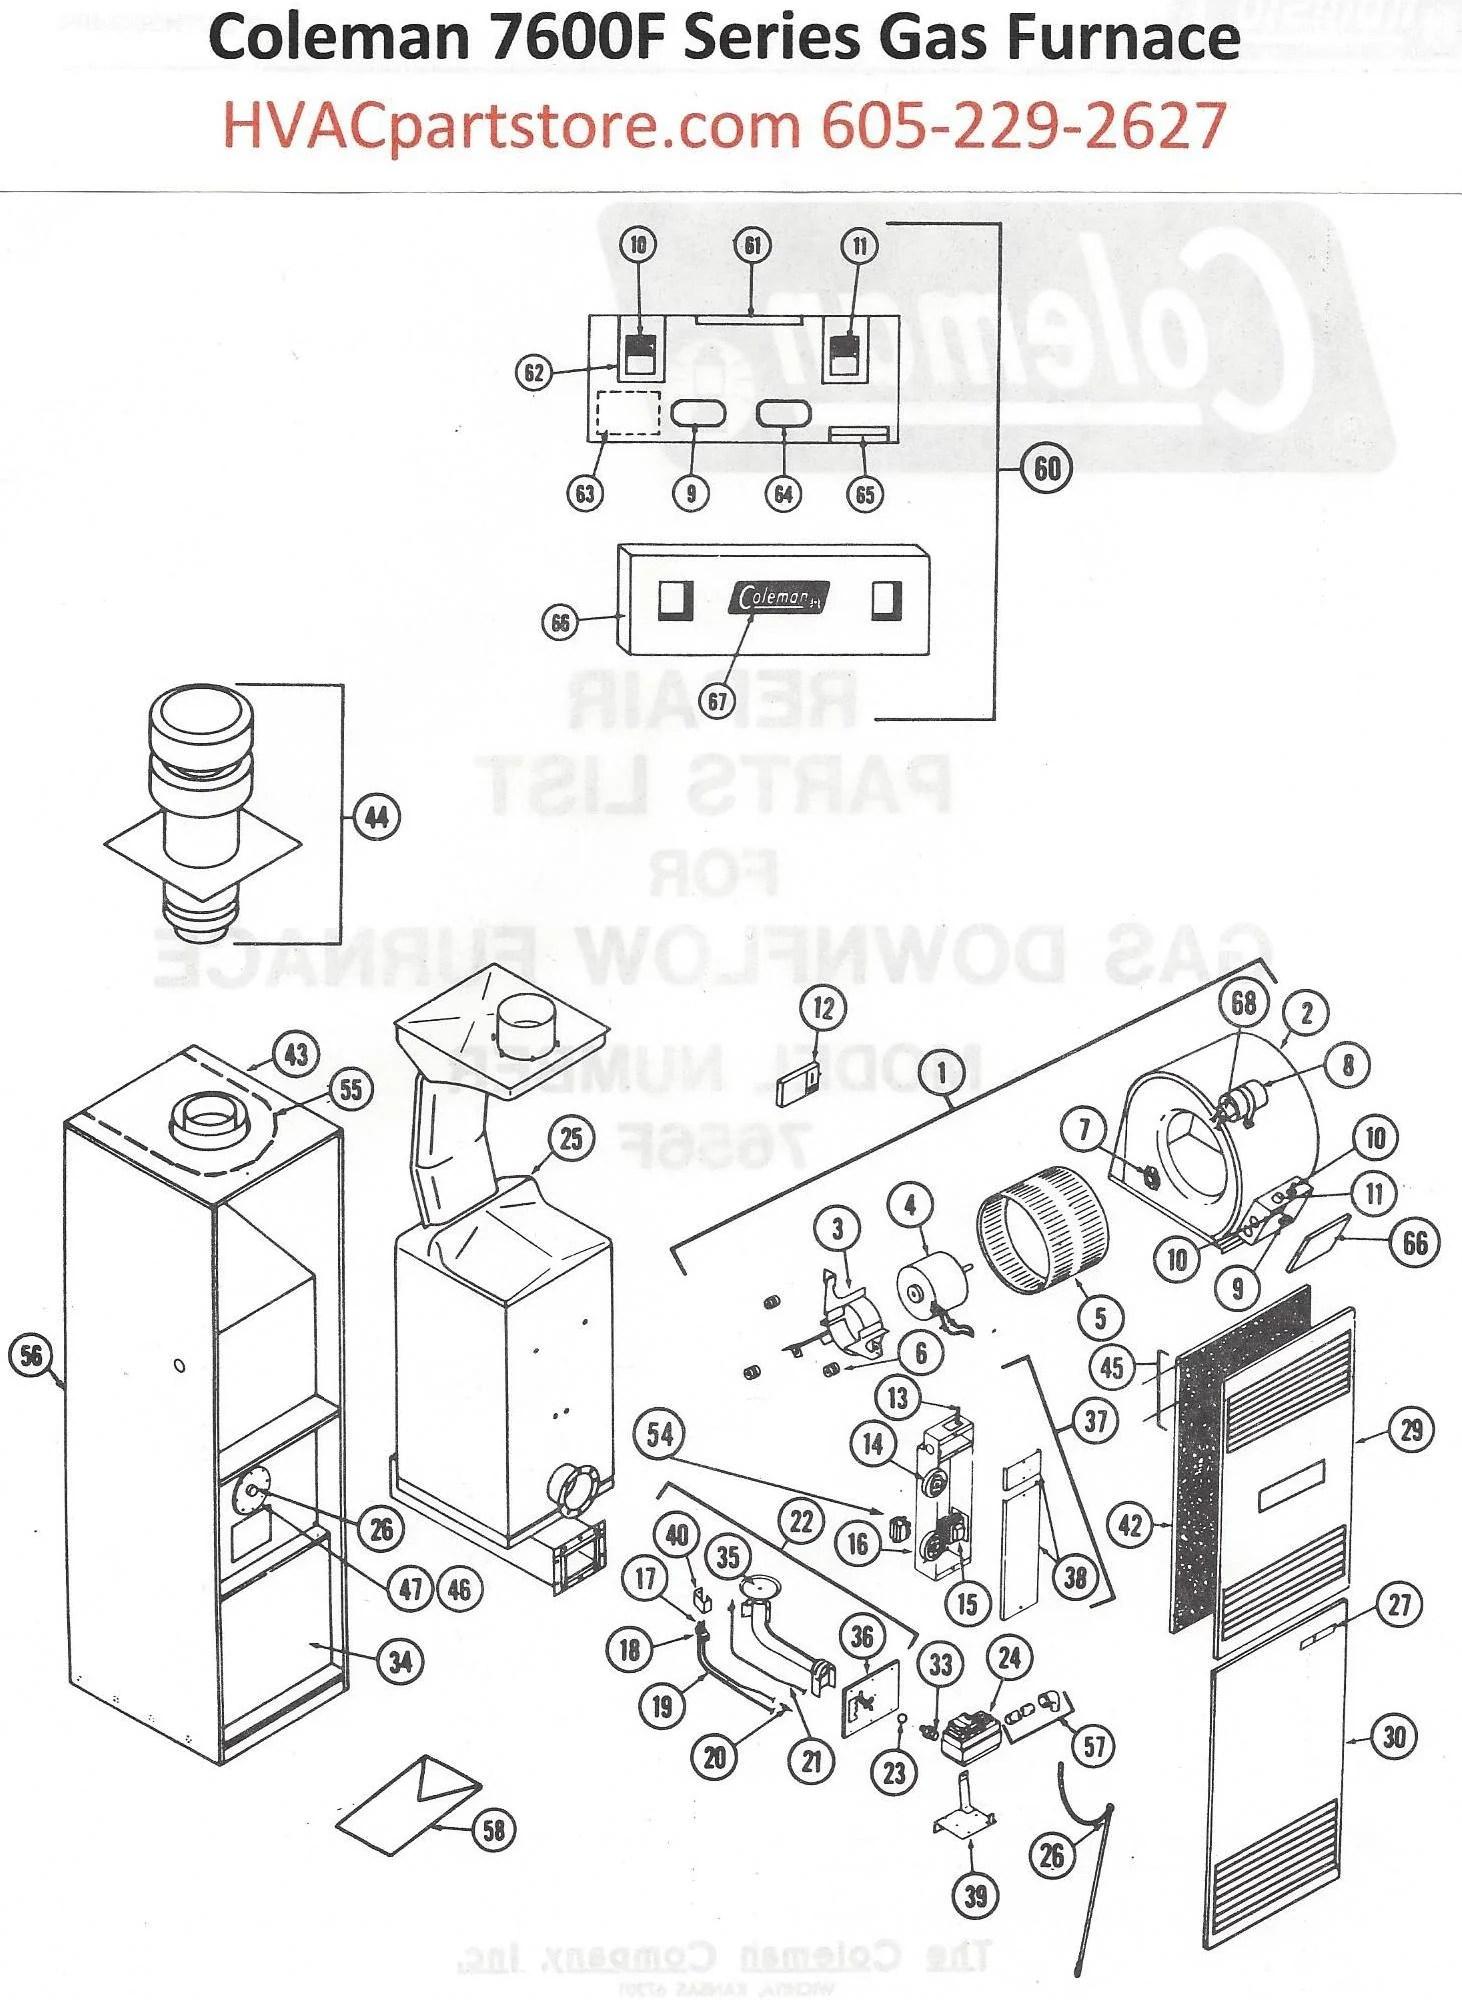 lennox wiring diagrams signal stat 900 sigflare dot qqc 76 diagram 7656f856 coleman gas furnace parts – hvacpartstore